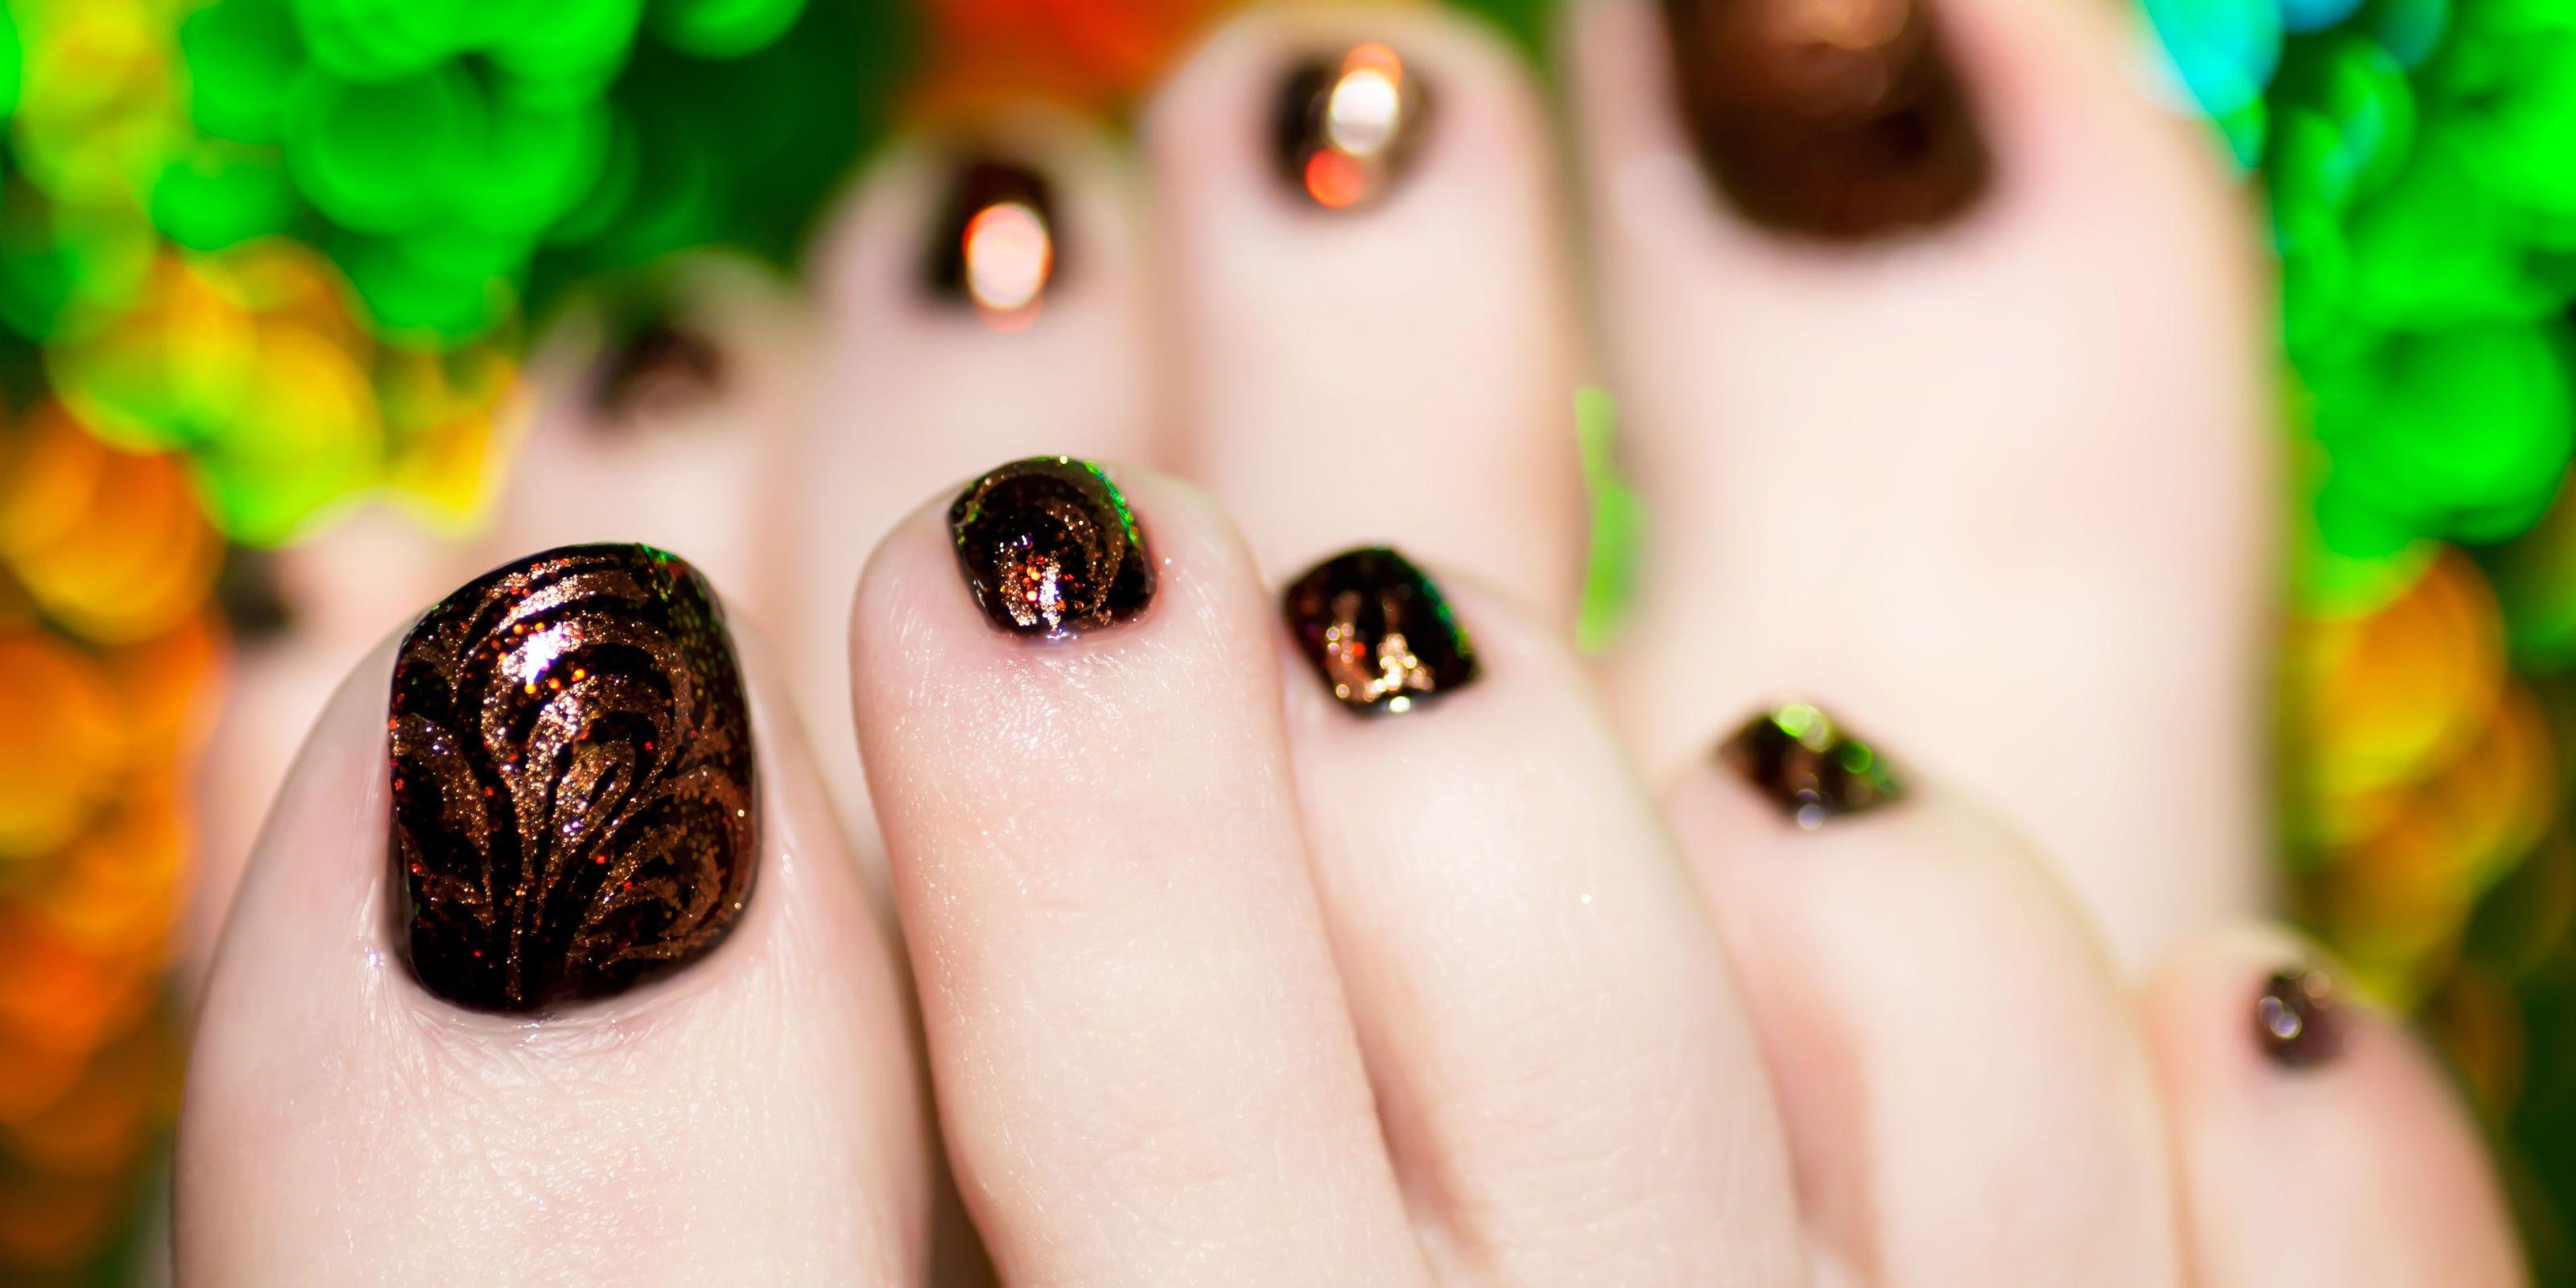 toe nail art designs - Roho.4senses.co